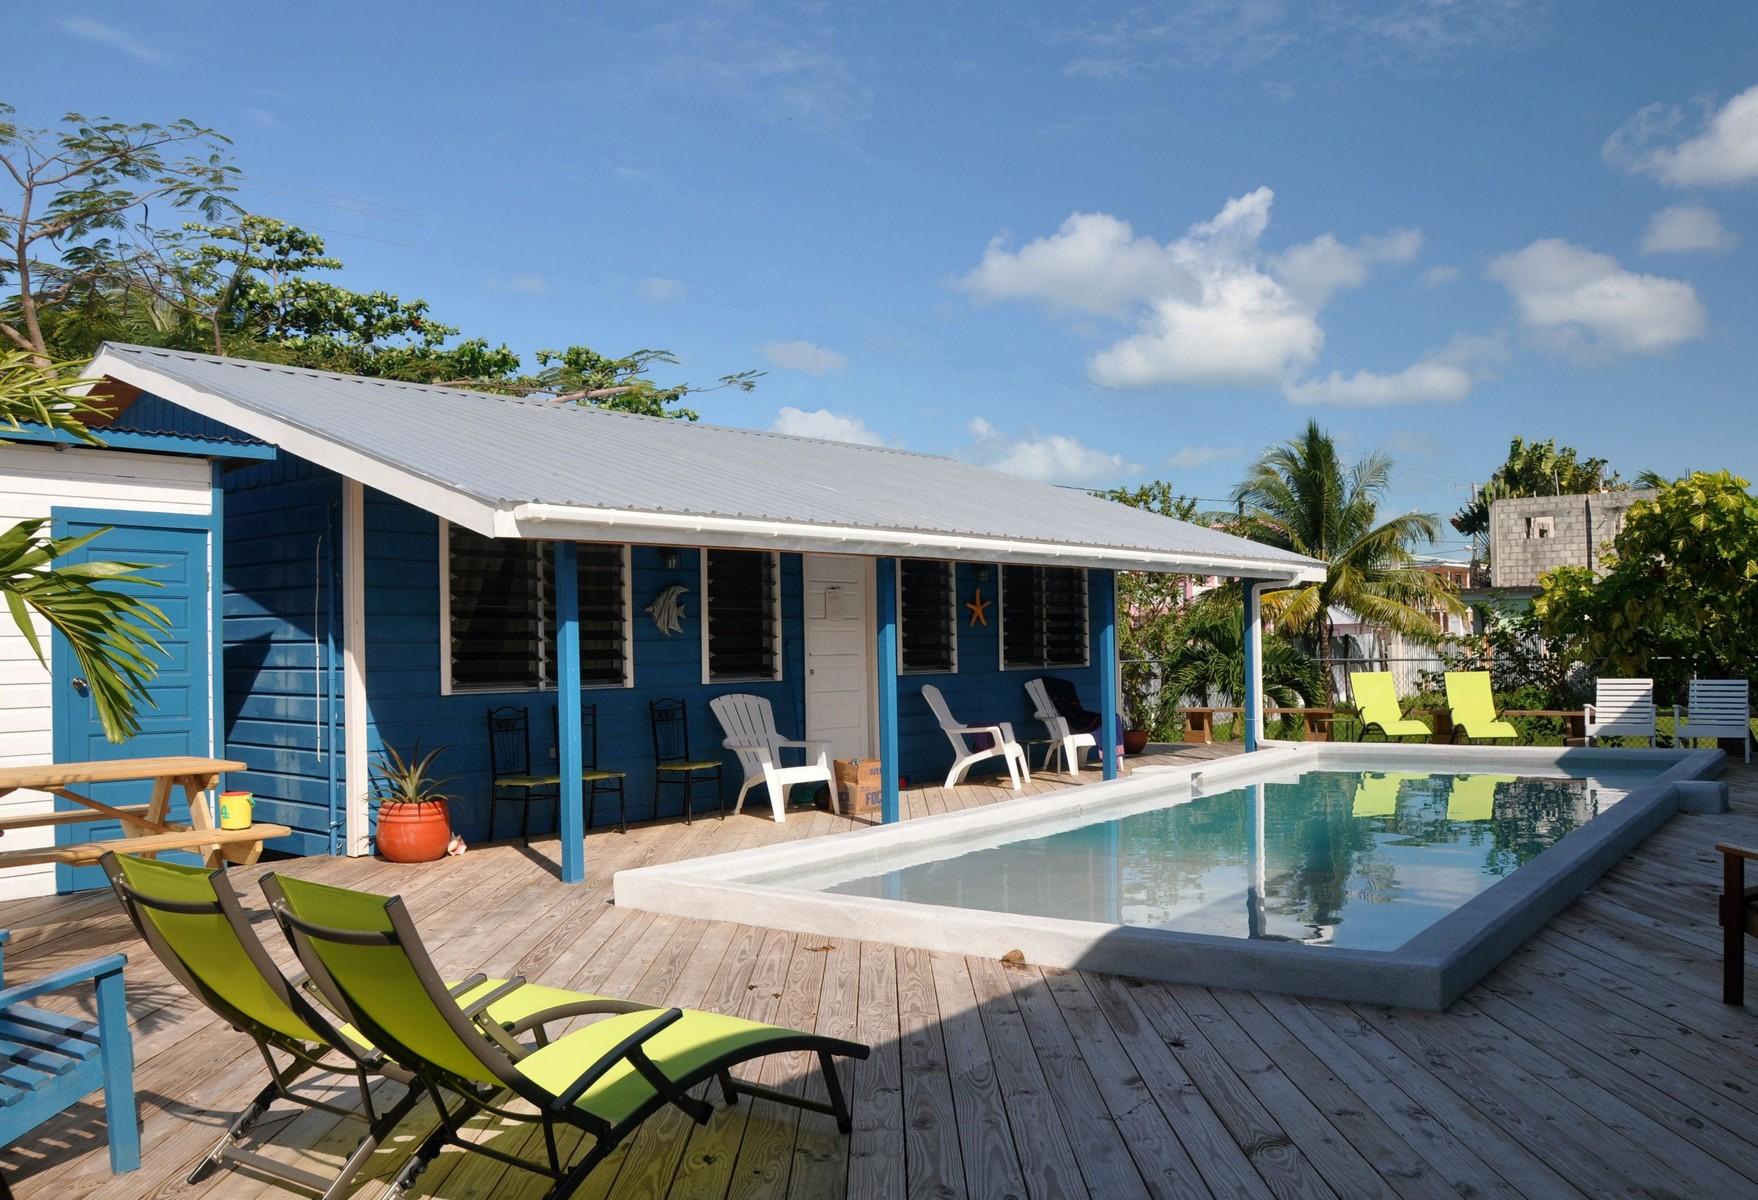 Casa multifamiliare per Vendita alle ore Caye Caulker Cabana's Caye Caulker, Belize, Belize